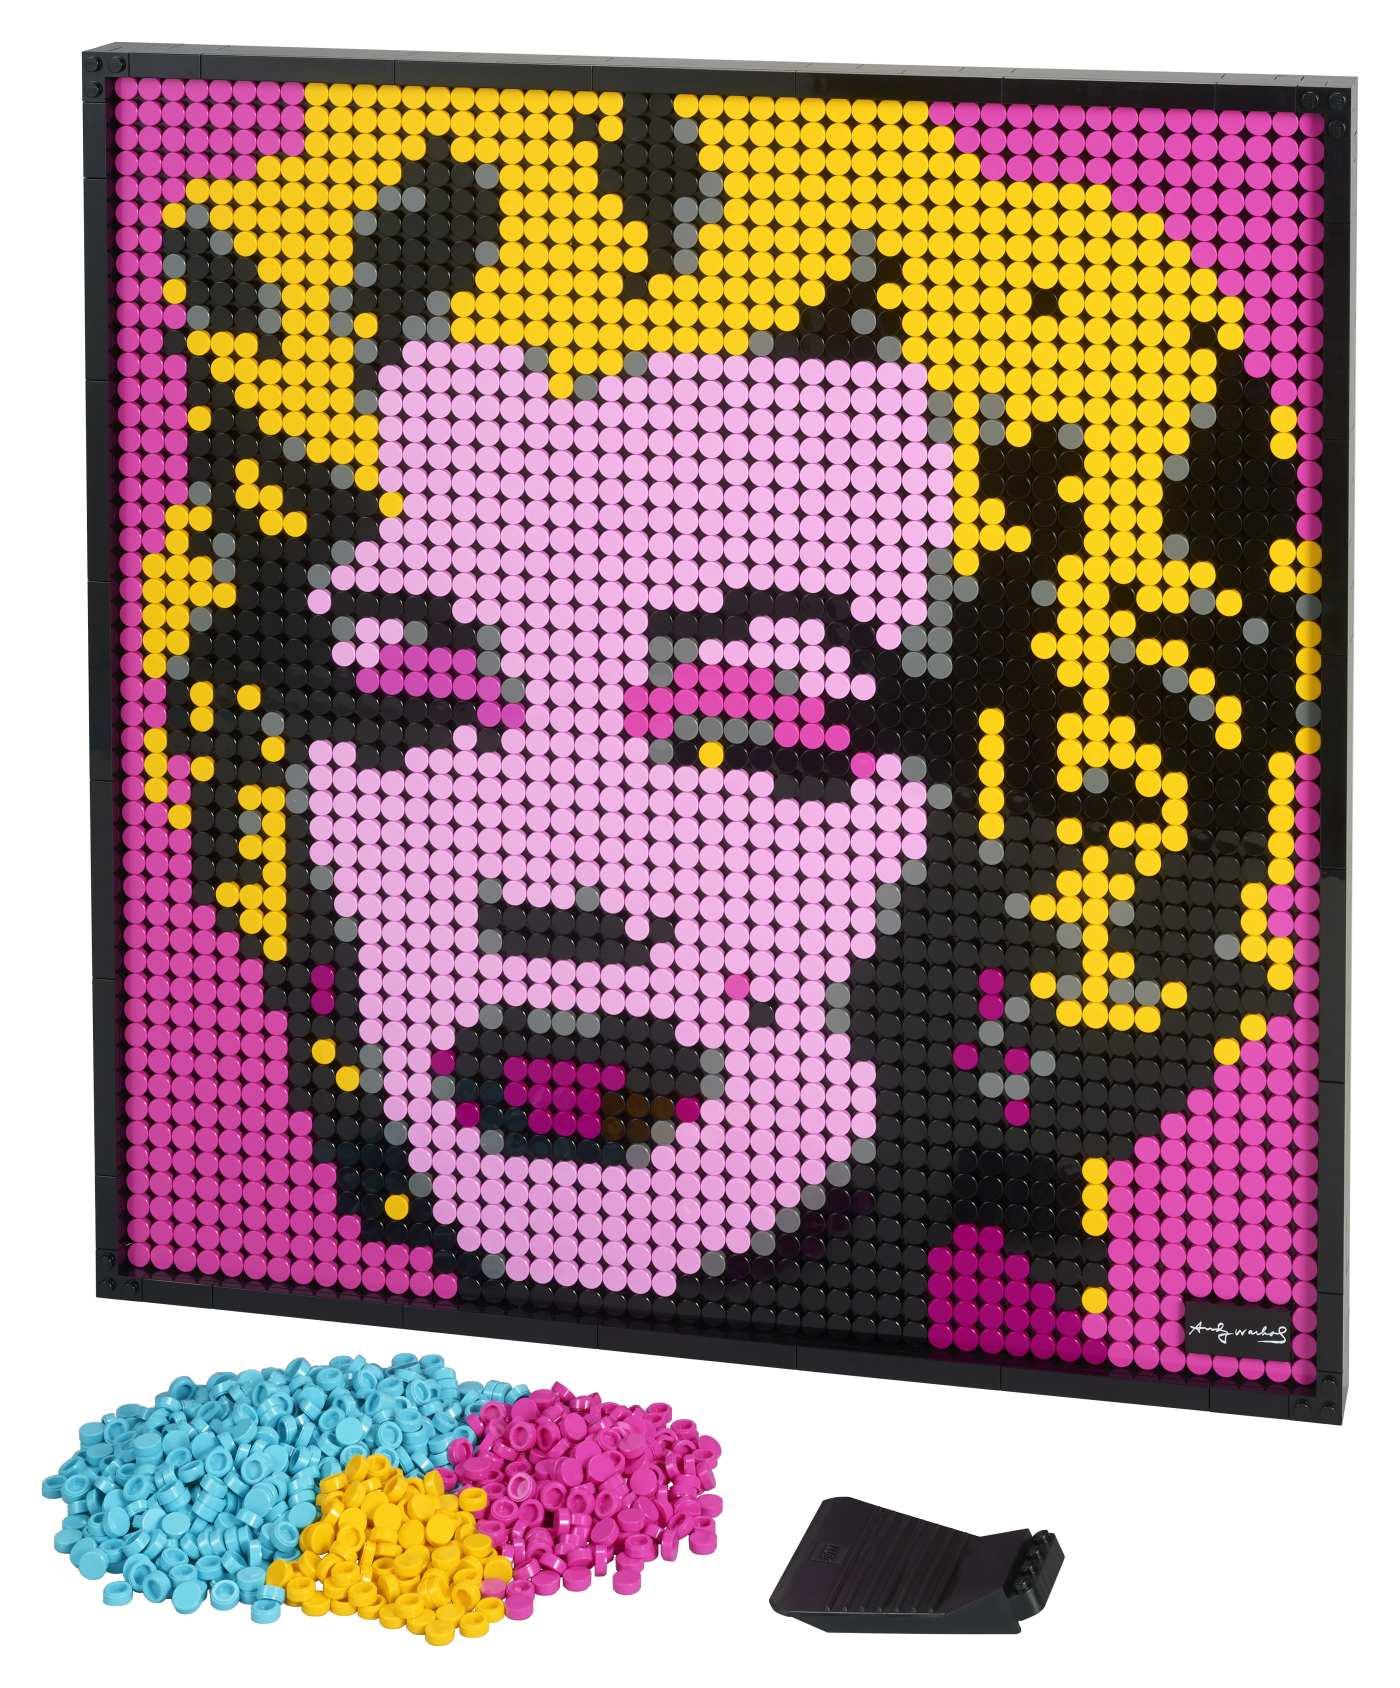 Lego Andy Warhol's Marilyn Monroe